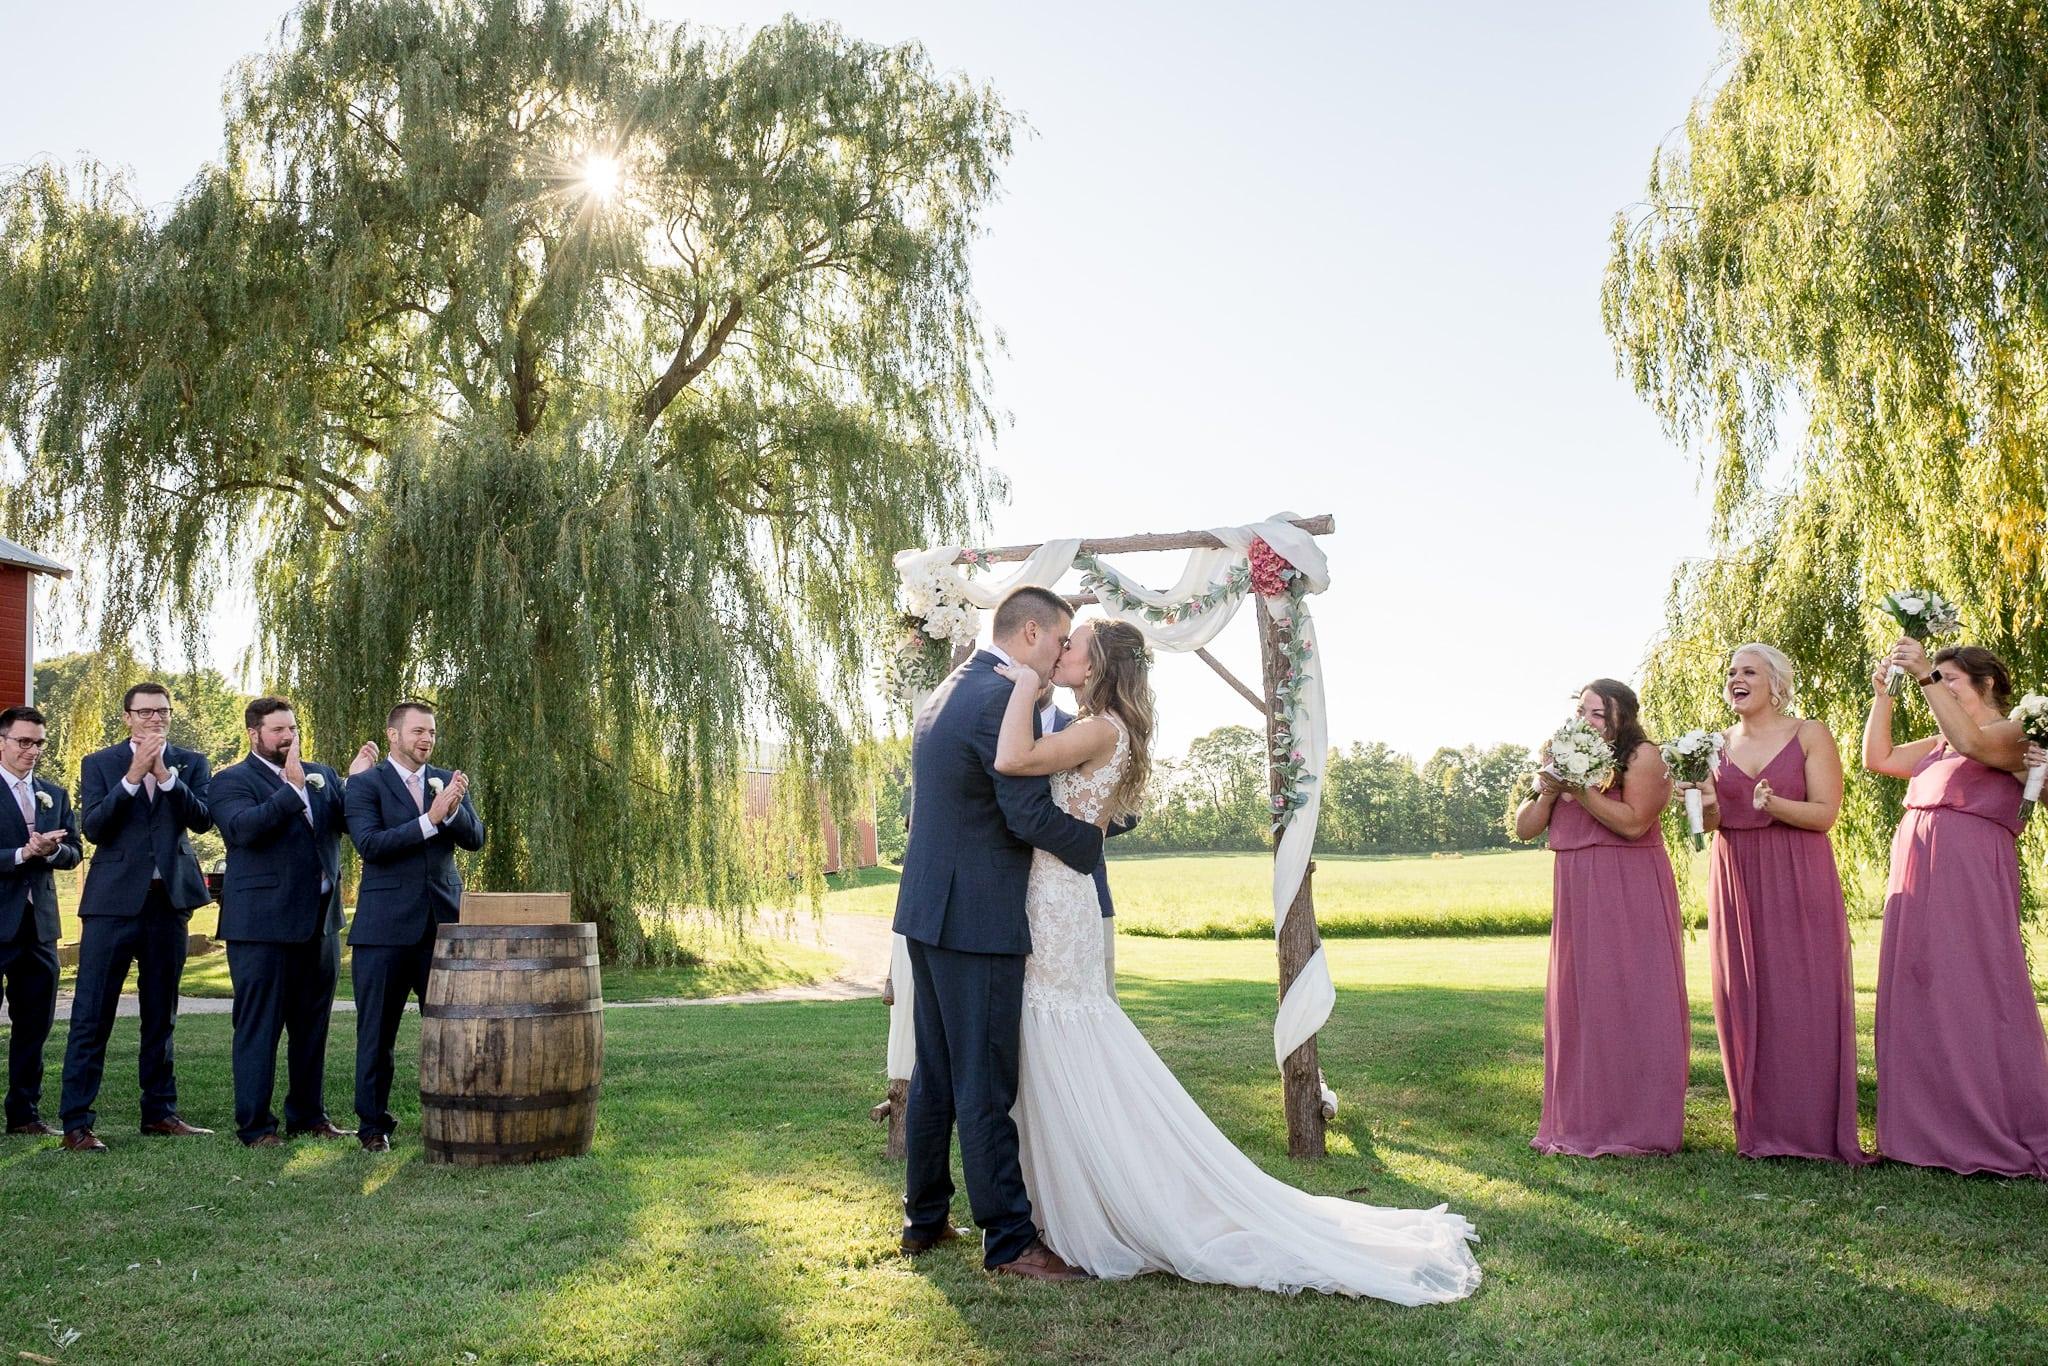 green bay wedding photographer,luke collins photography, door county wedding photographer, green bay wedding photographer, wisconsin, sturgeon bay photographer, wedding photographer